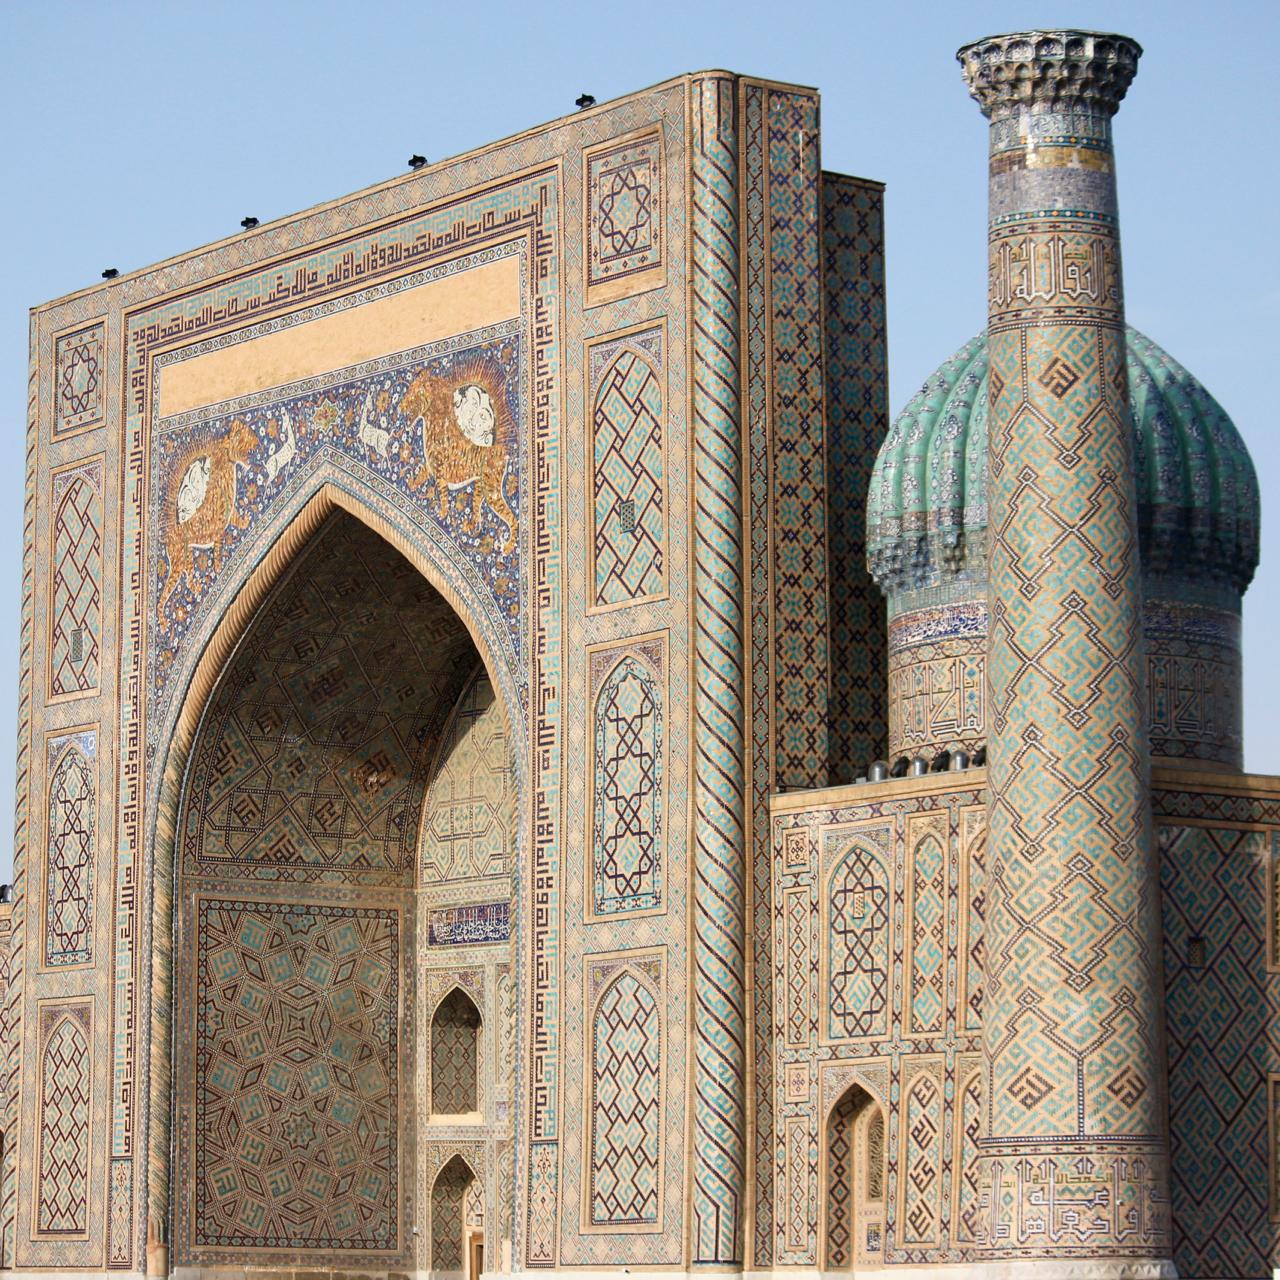 samarkand, uzbekistan - 18